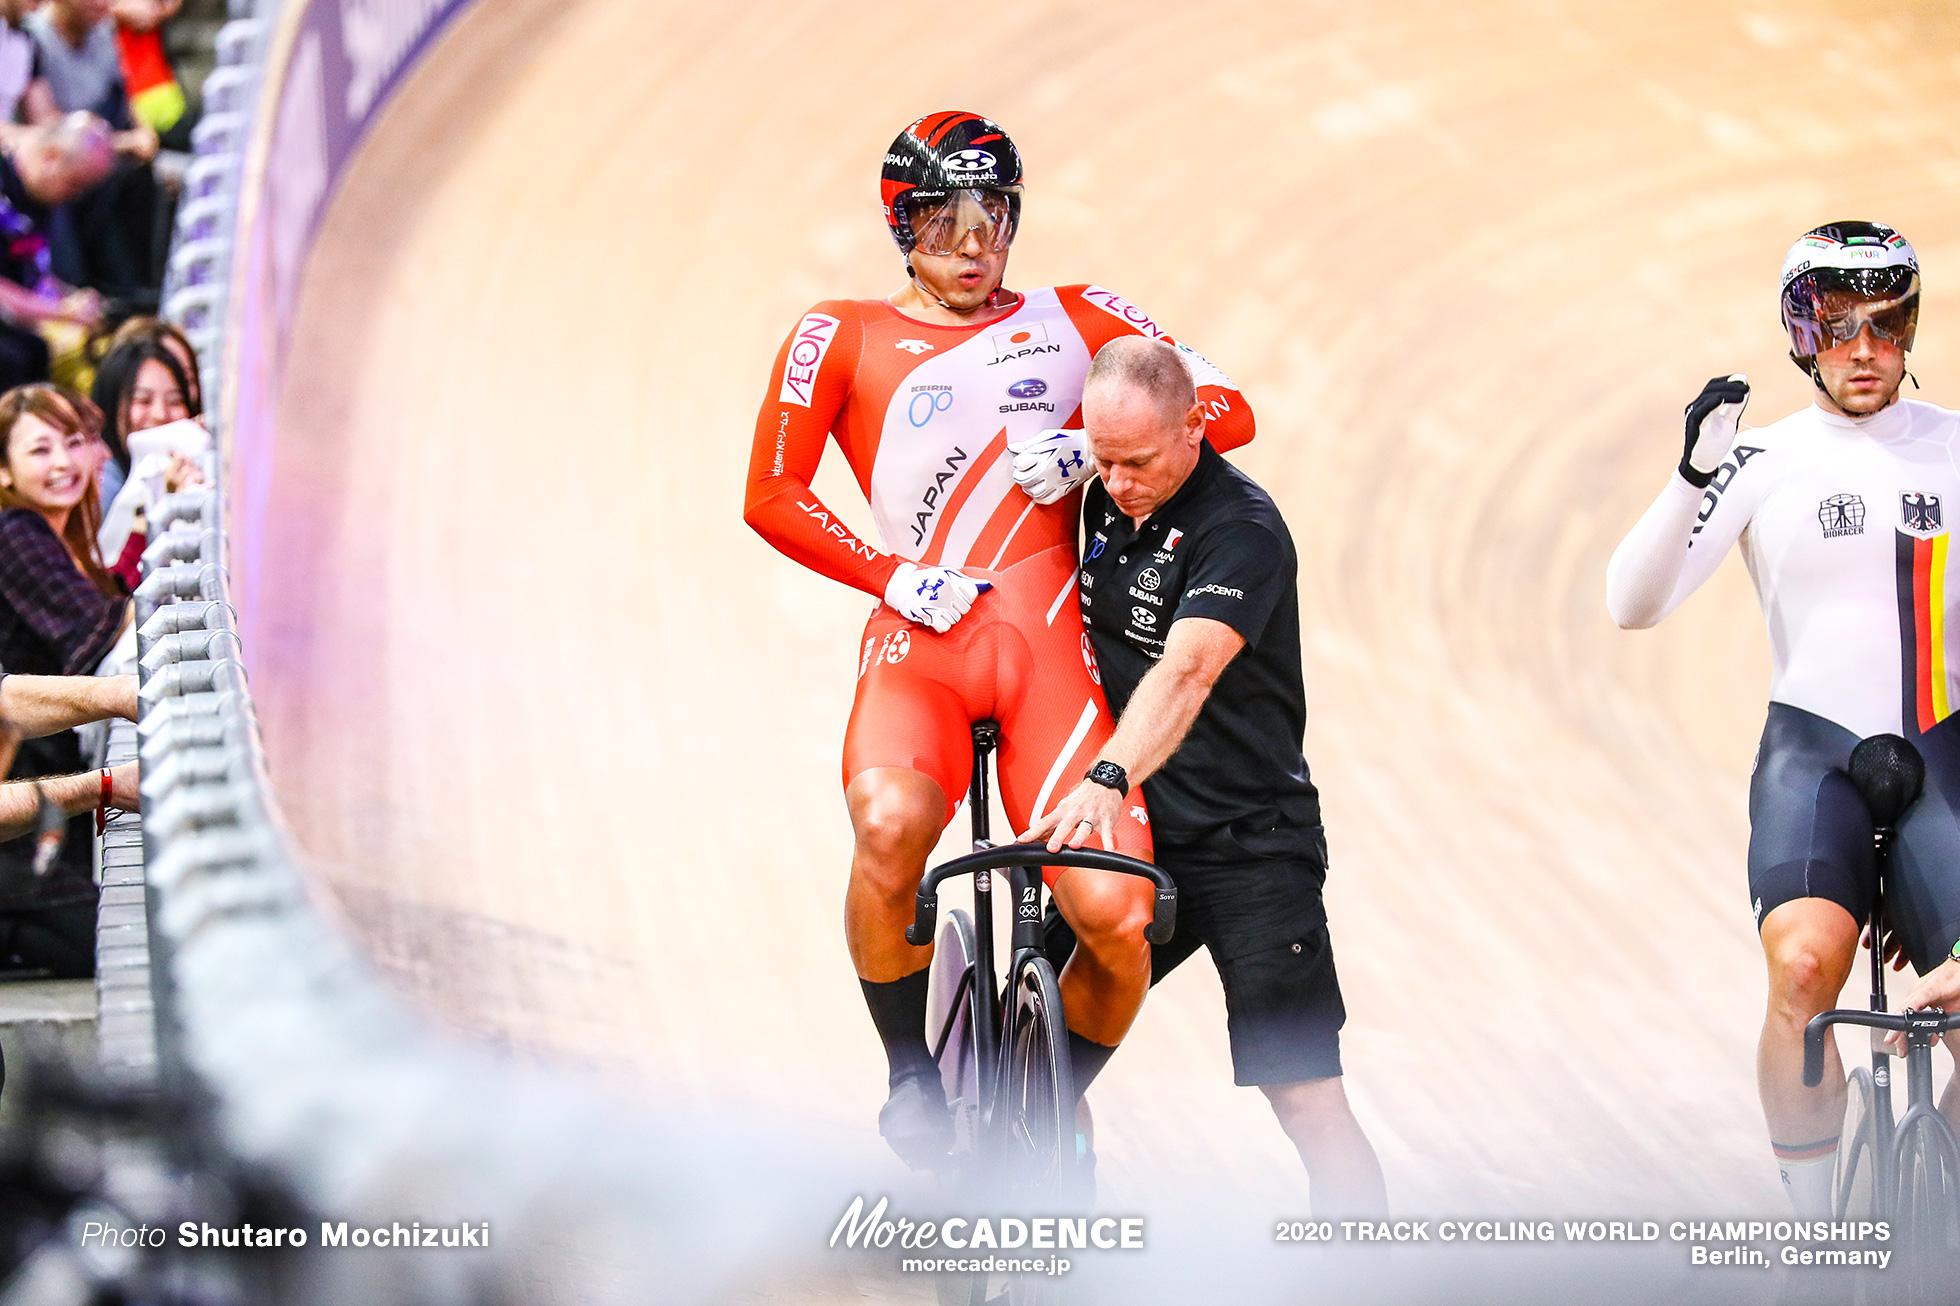 1st Round / Men's Keirin / 2020 Track Cycling World Championships, Nitta Yudai 新田祐大